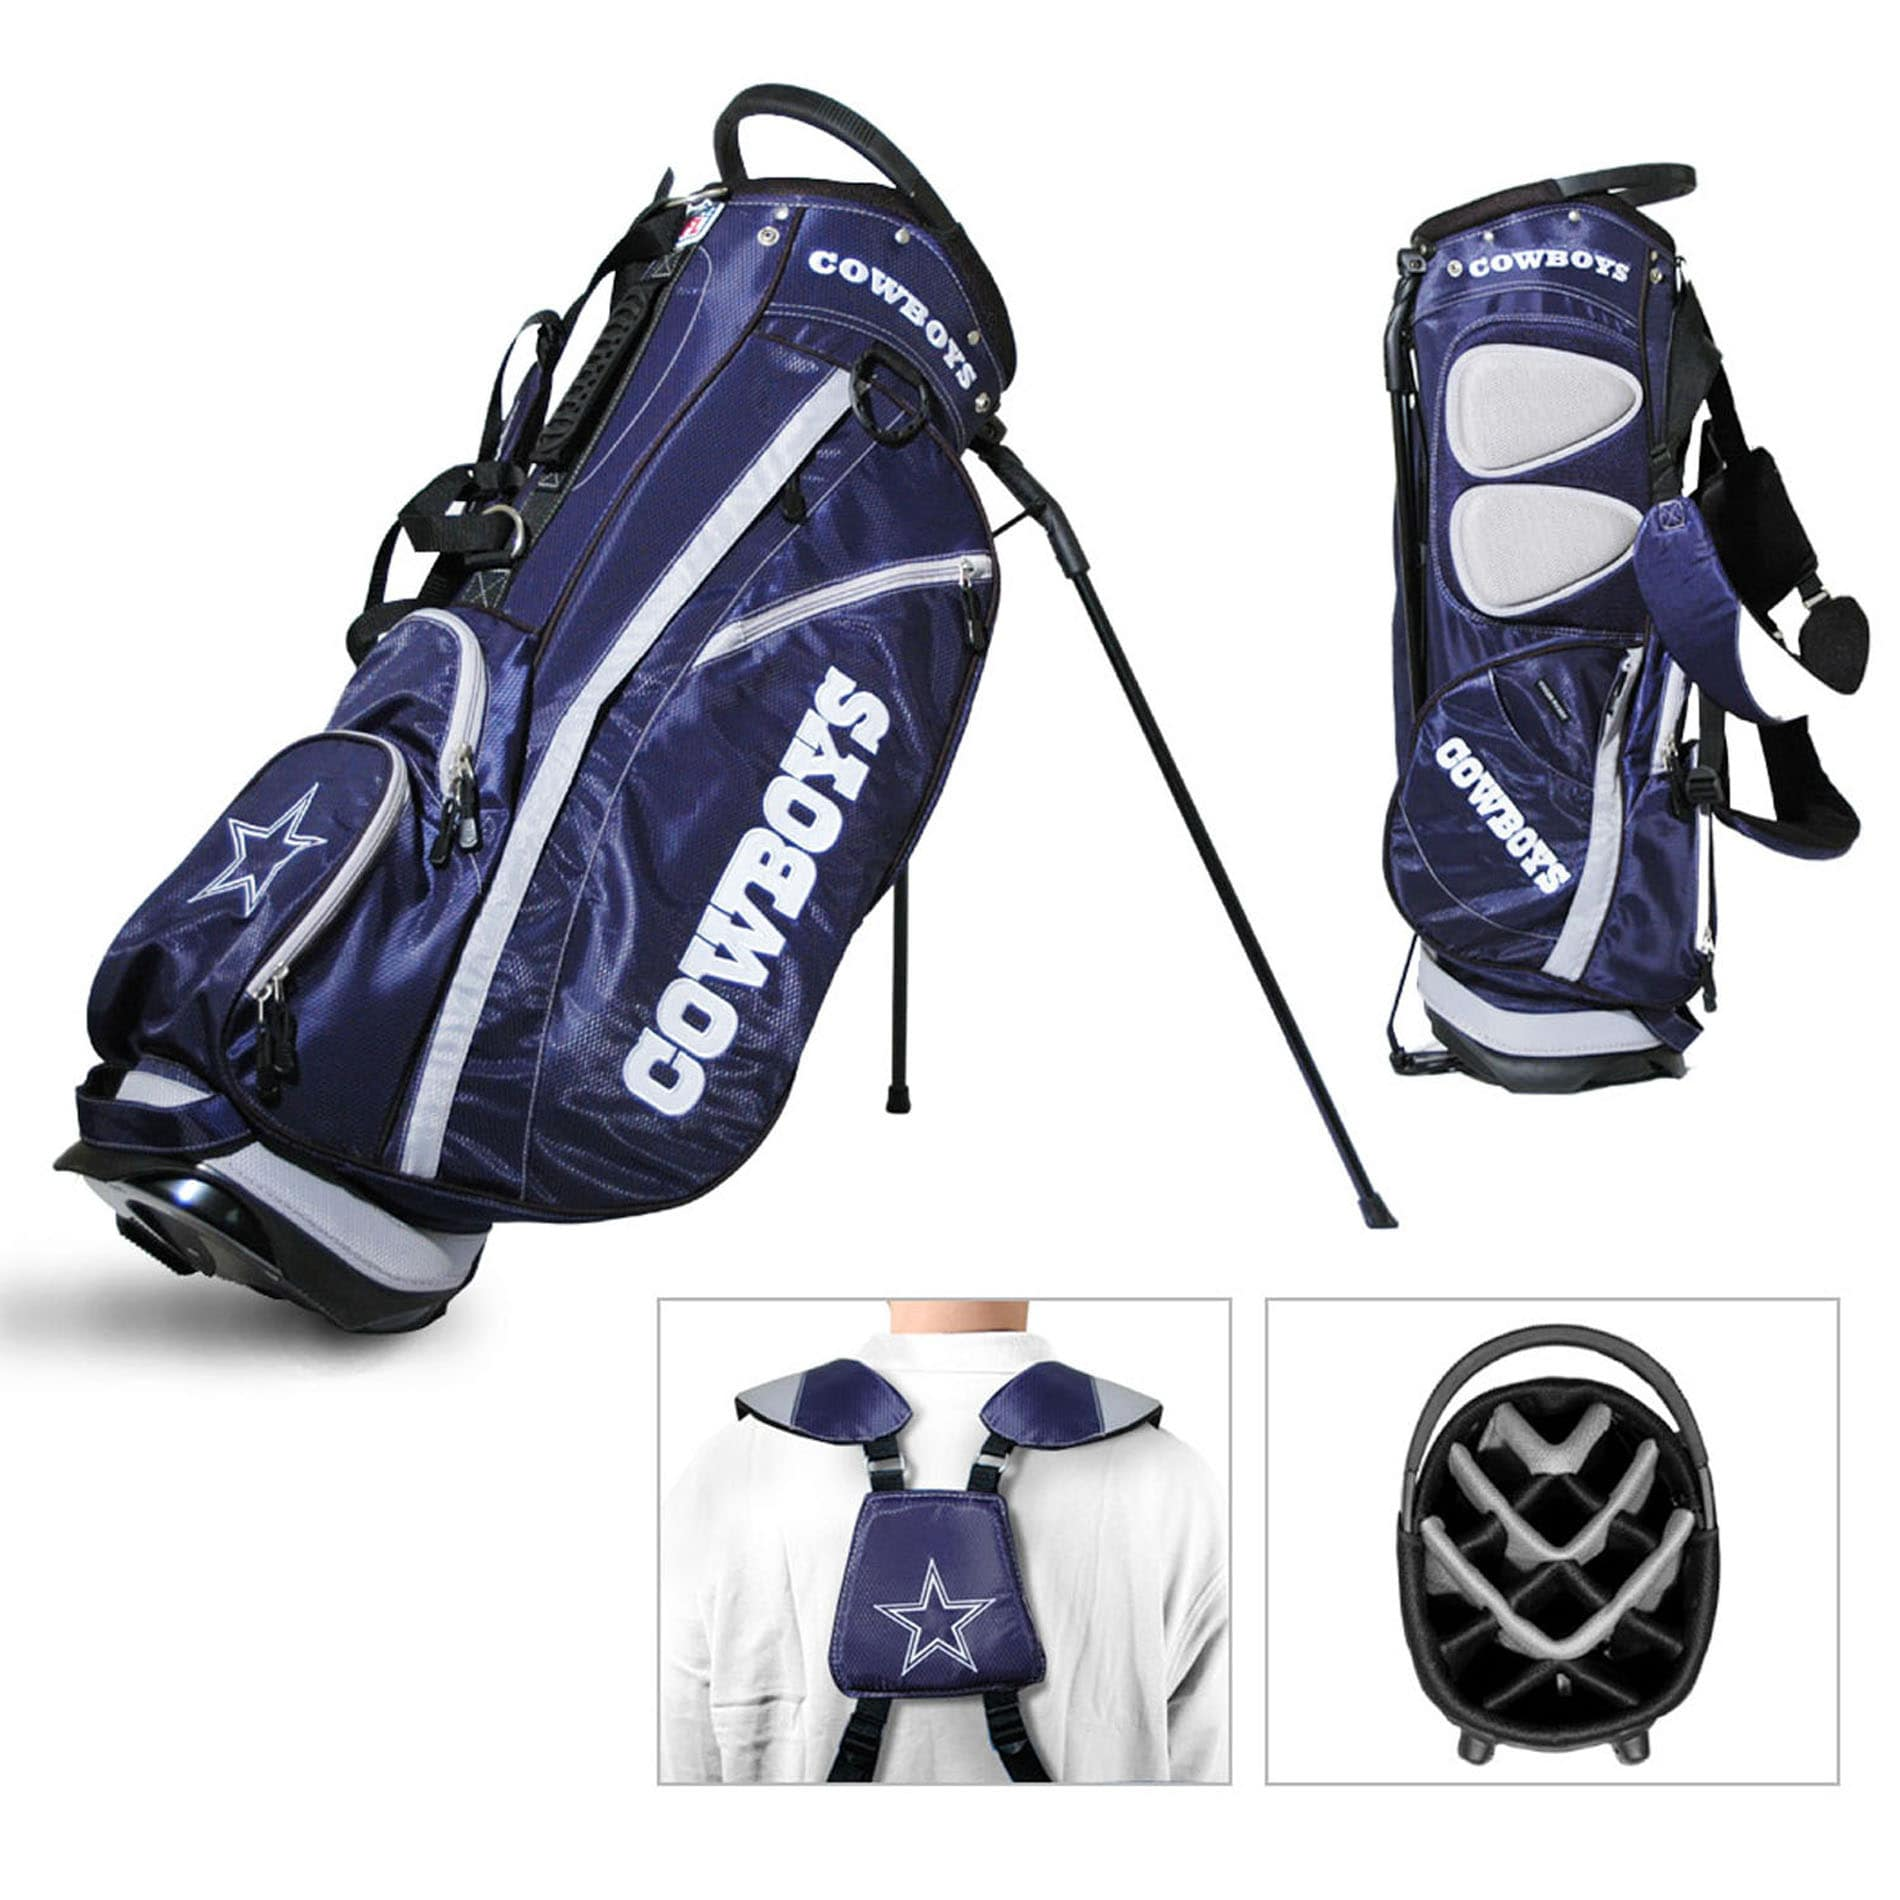 Dallas Cowboys NFL Fairway Stand Golf Bag